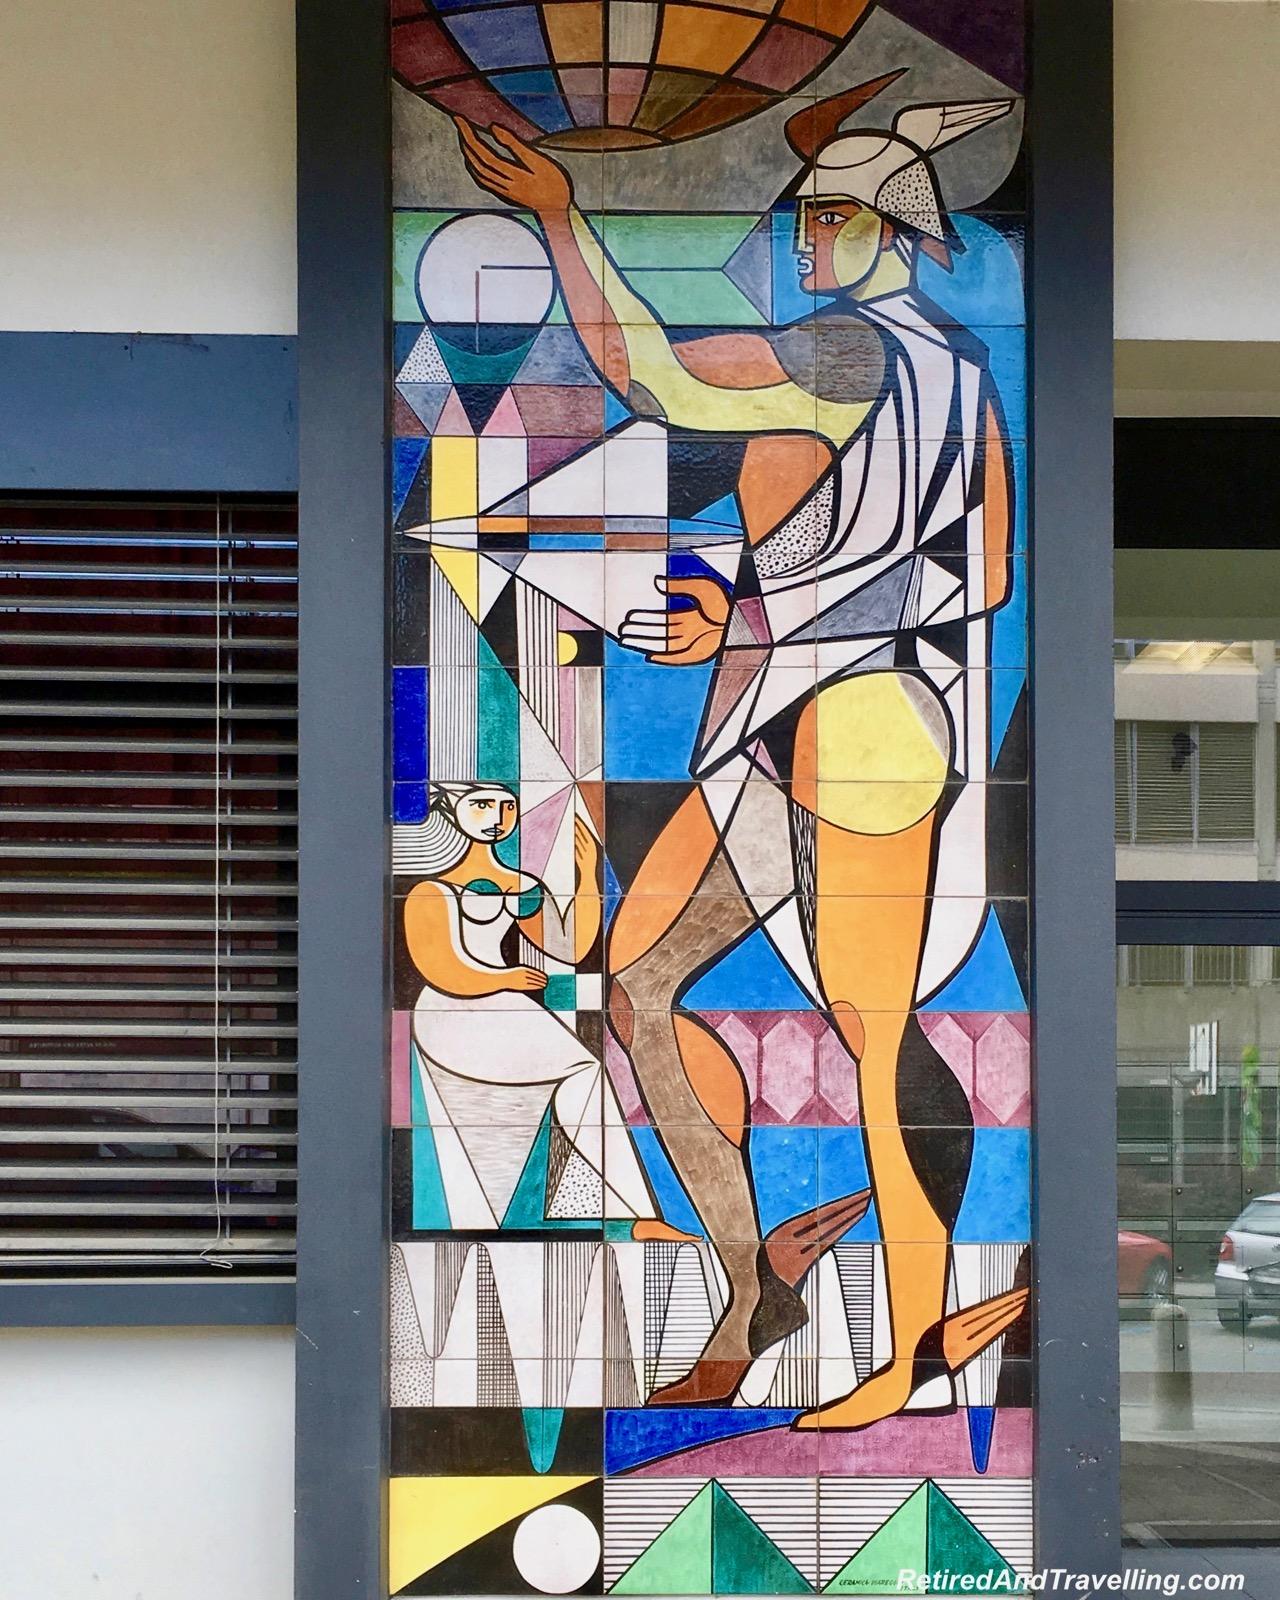 Ceramica via reggio Art - Things To See In Geneva.jpg